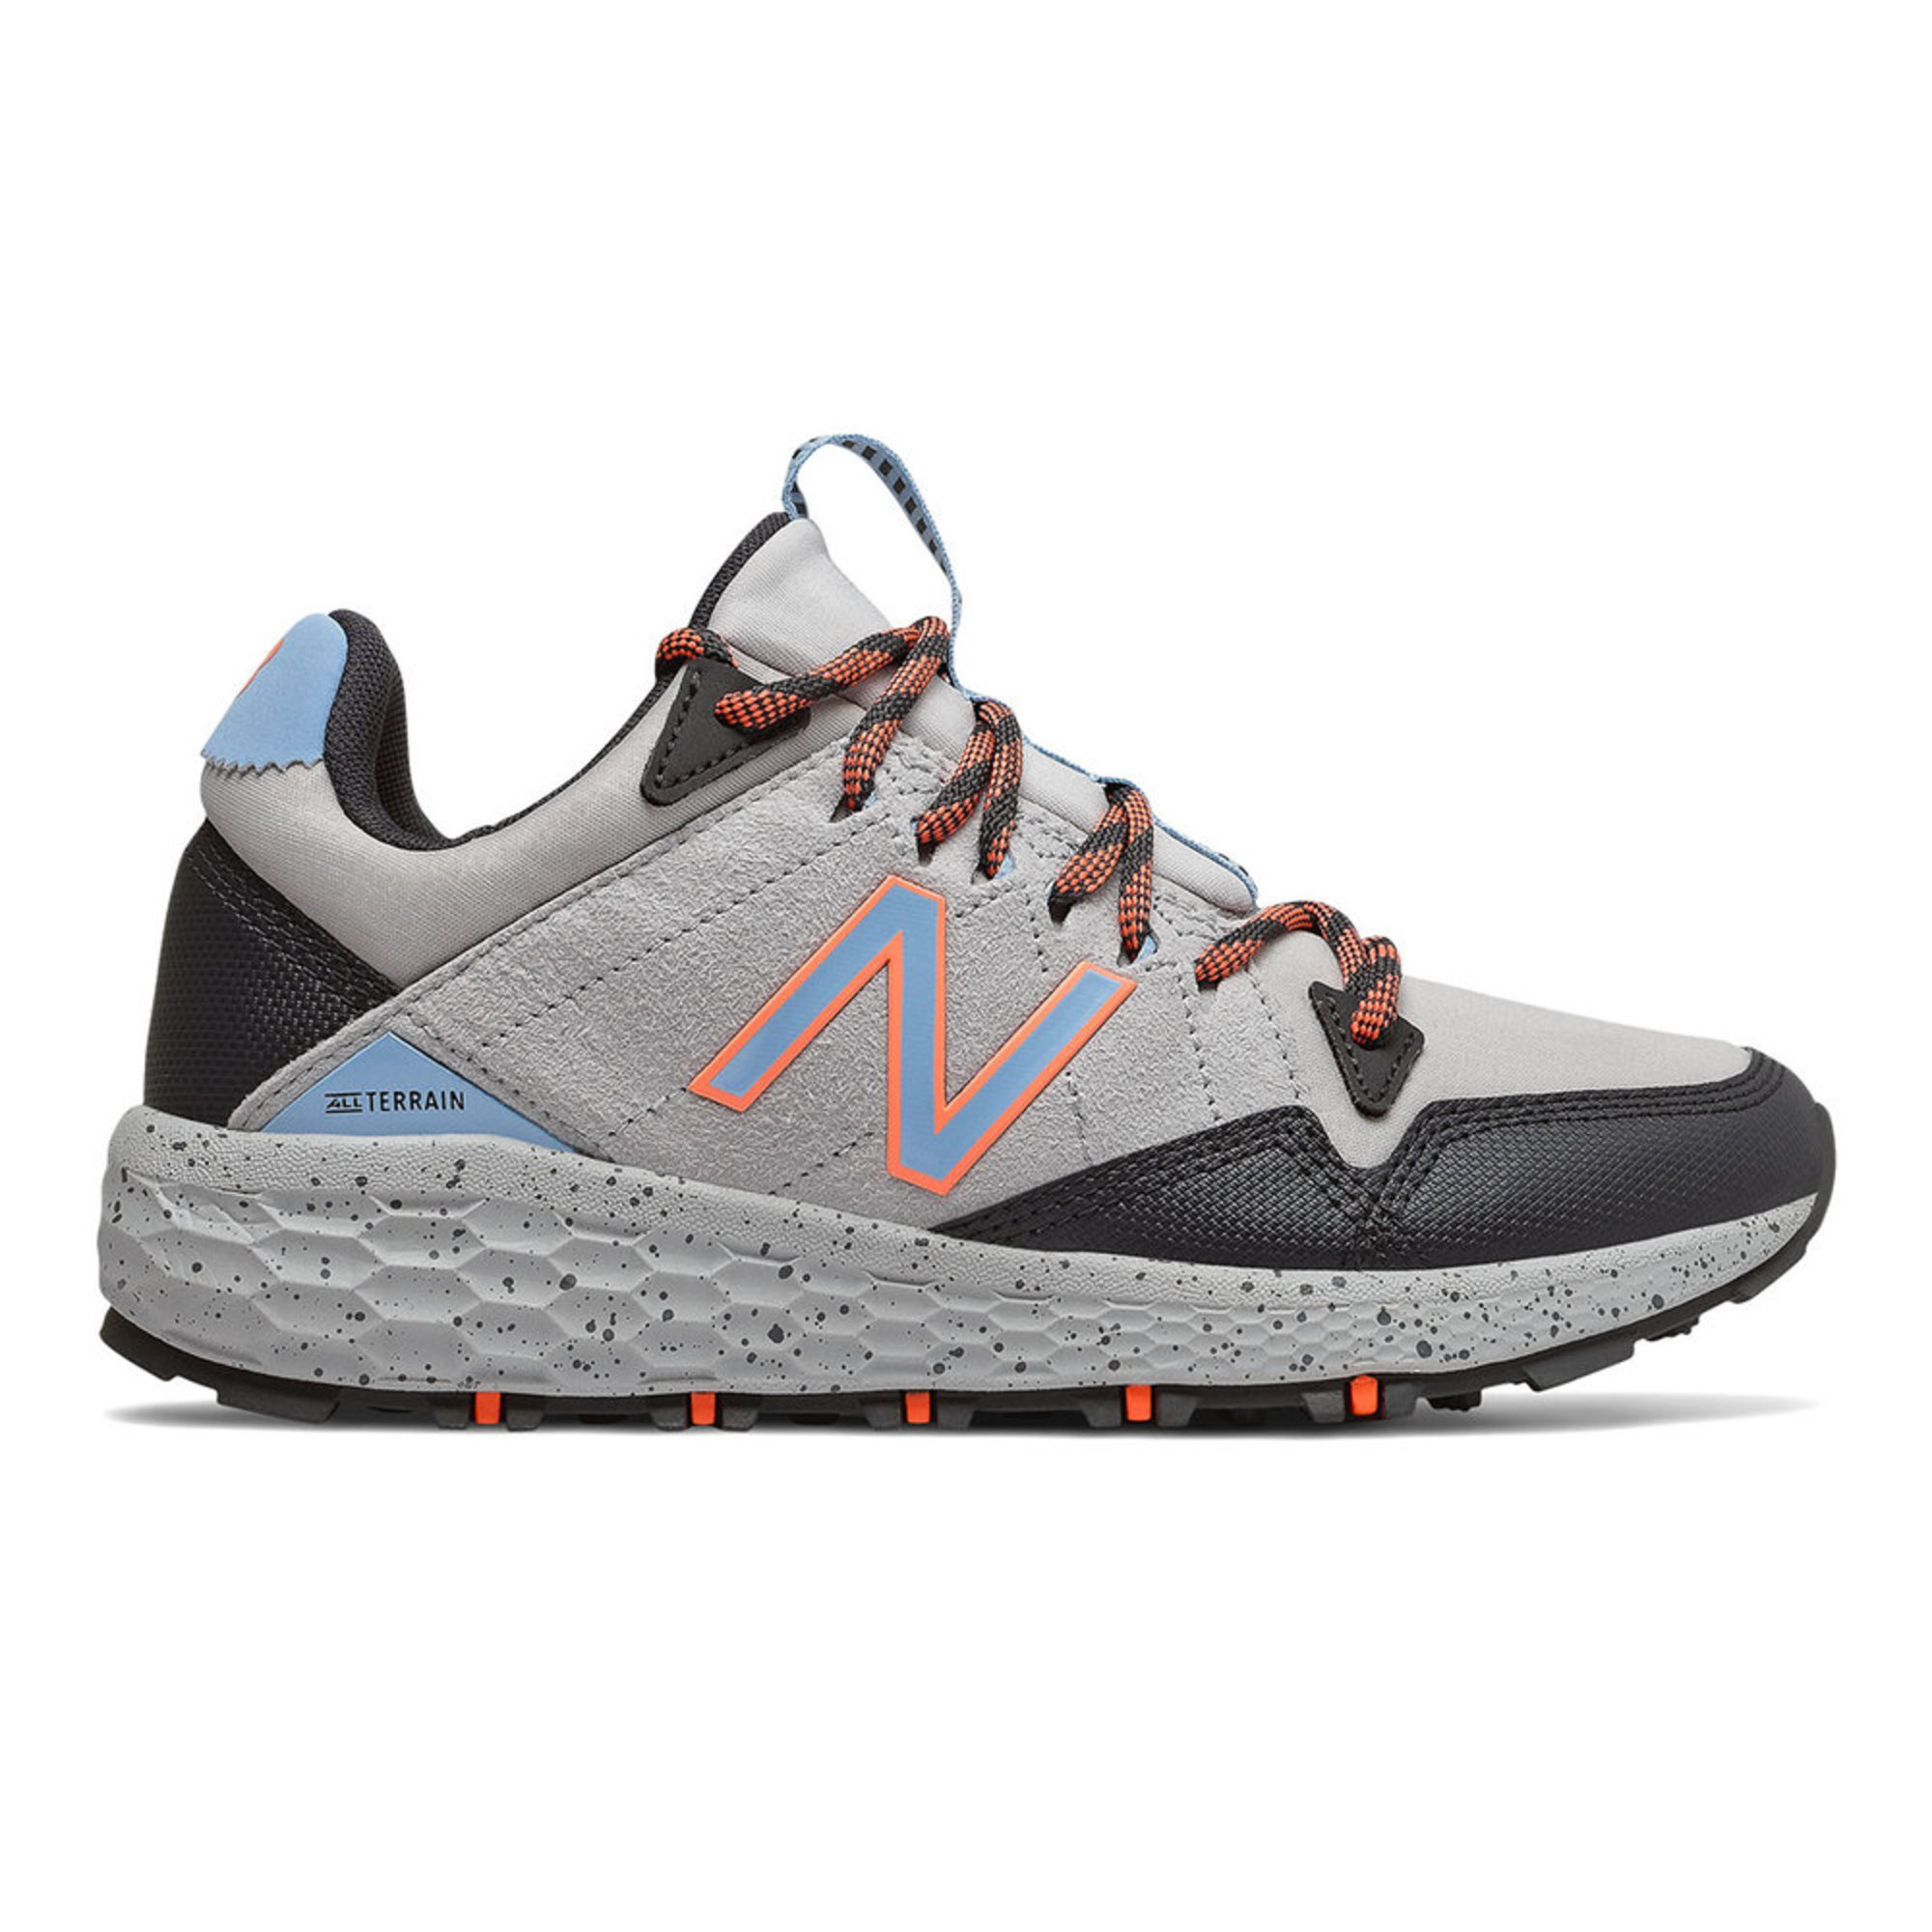 234440d5ddfa1 New Balance Women's Fresh Foam Crag Trail Running Shoe | Women's ...